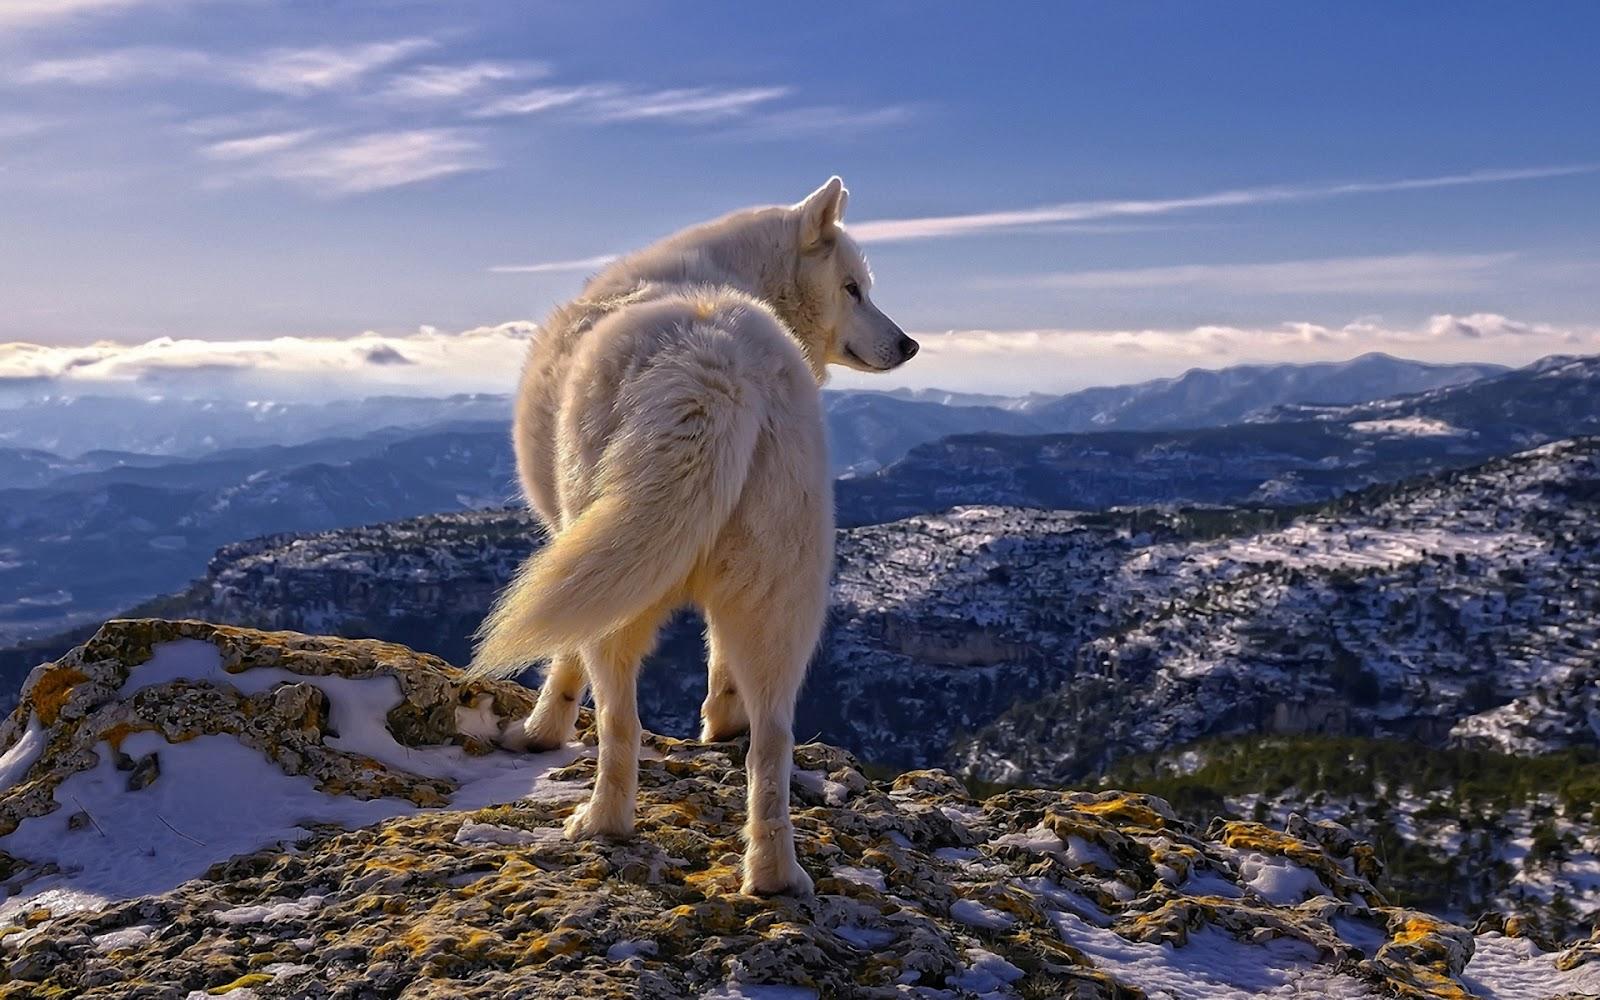 Wild Animal Wolf Wallpapers Hd 51074 Wallpaper: O Livro Da Natureza: Lobo